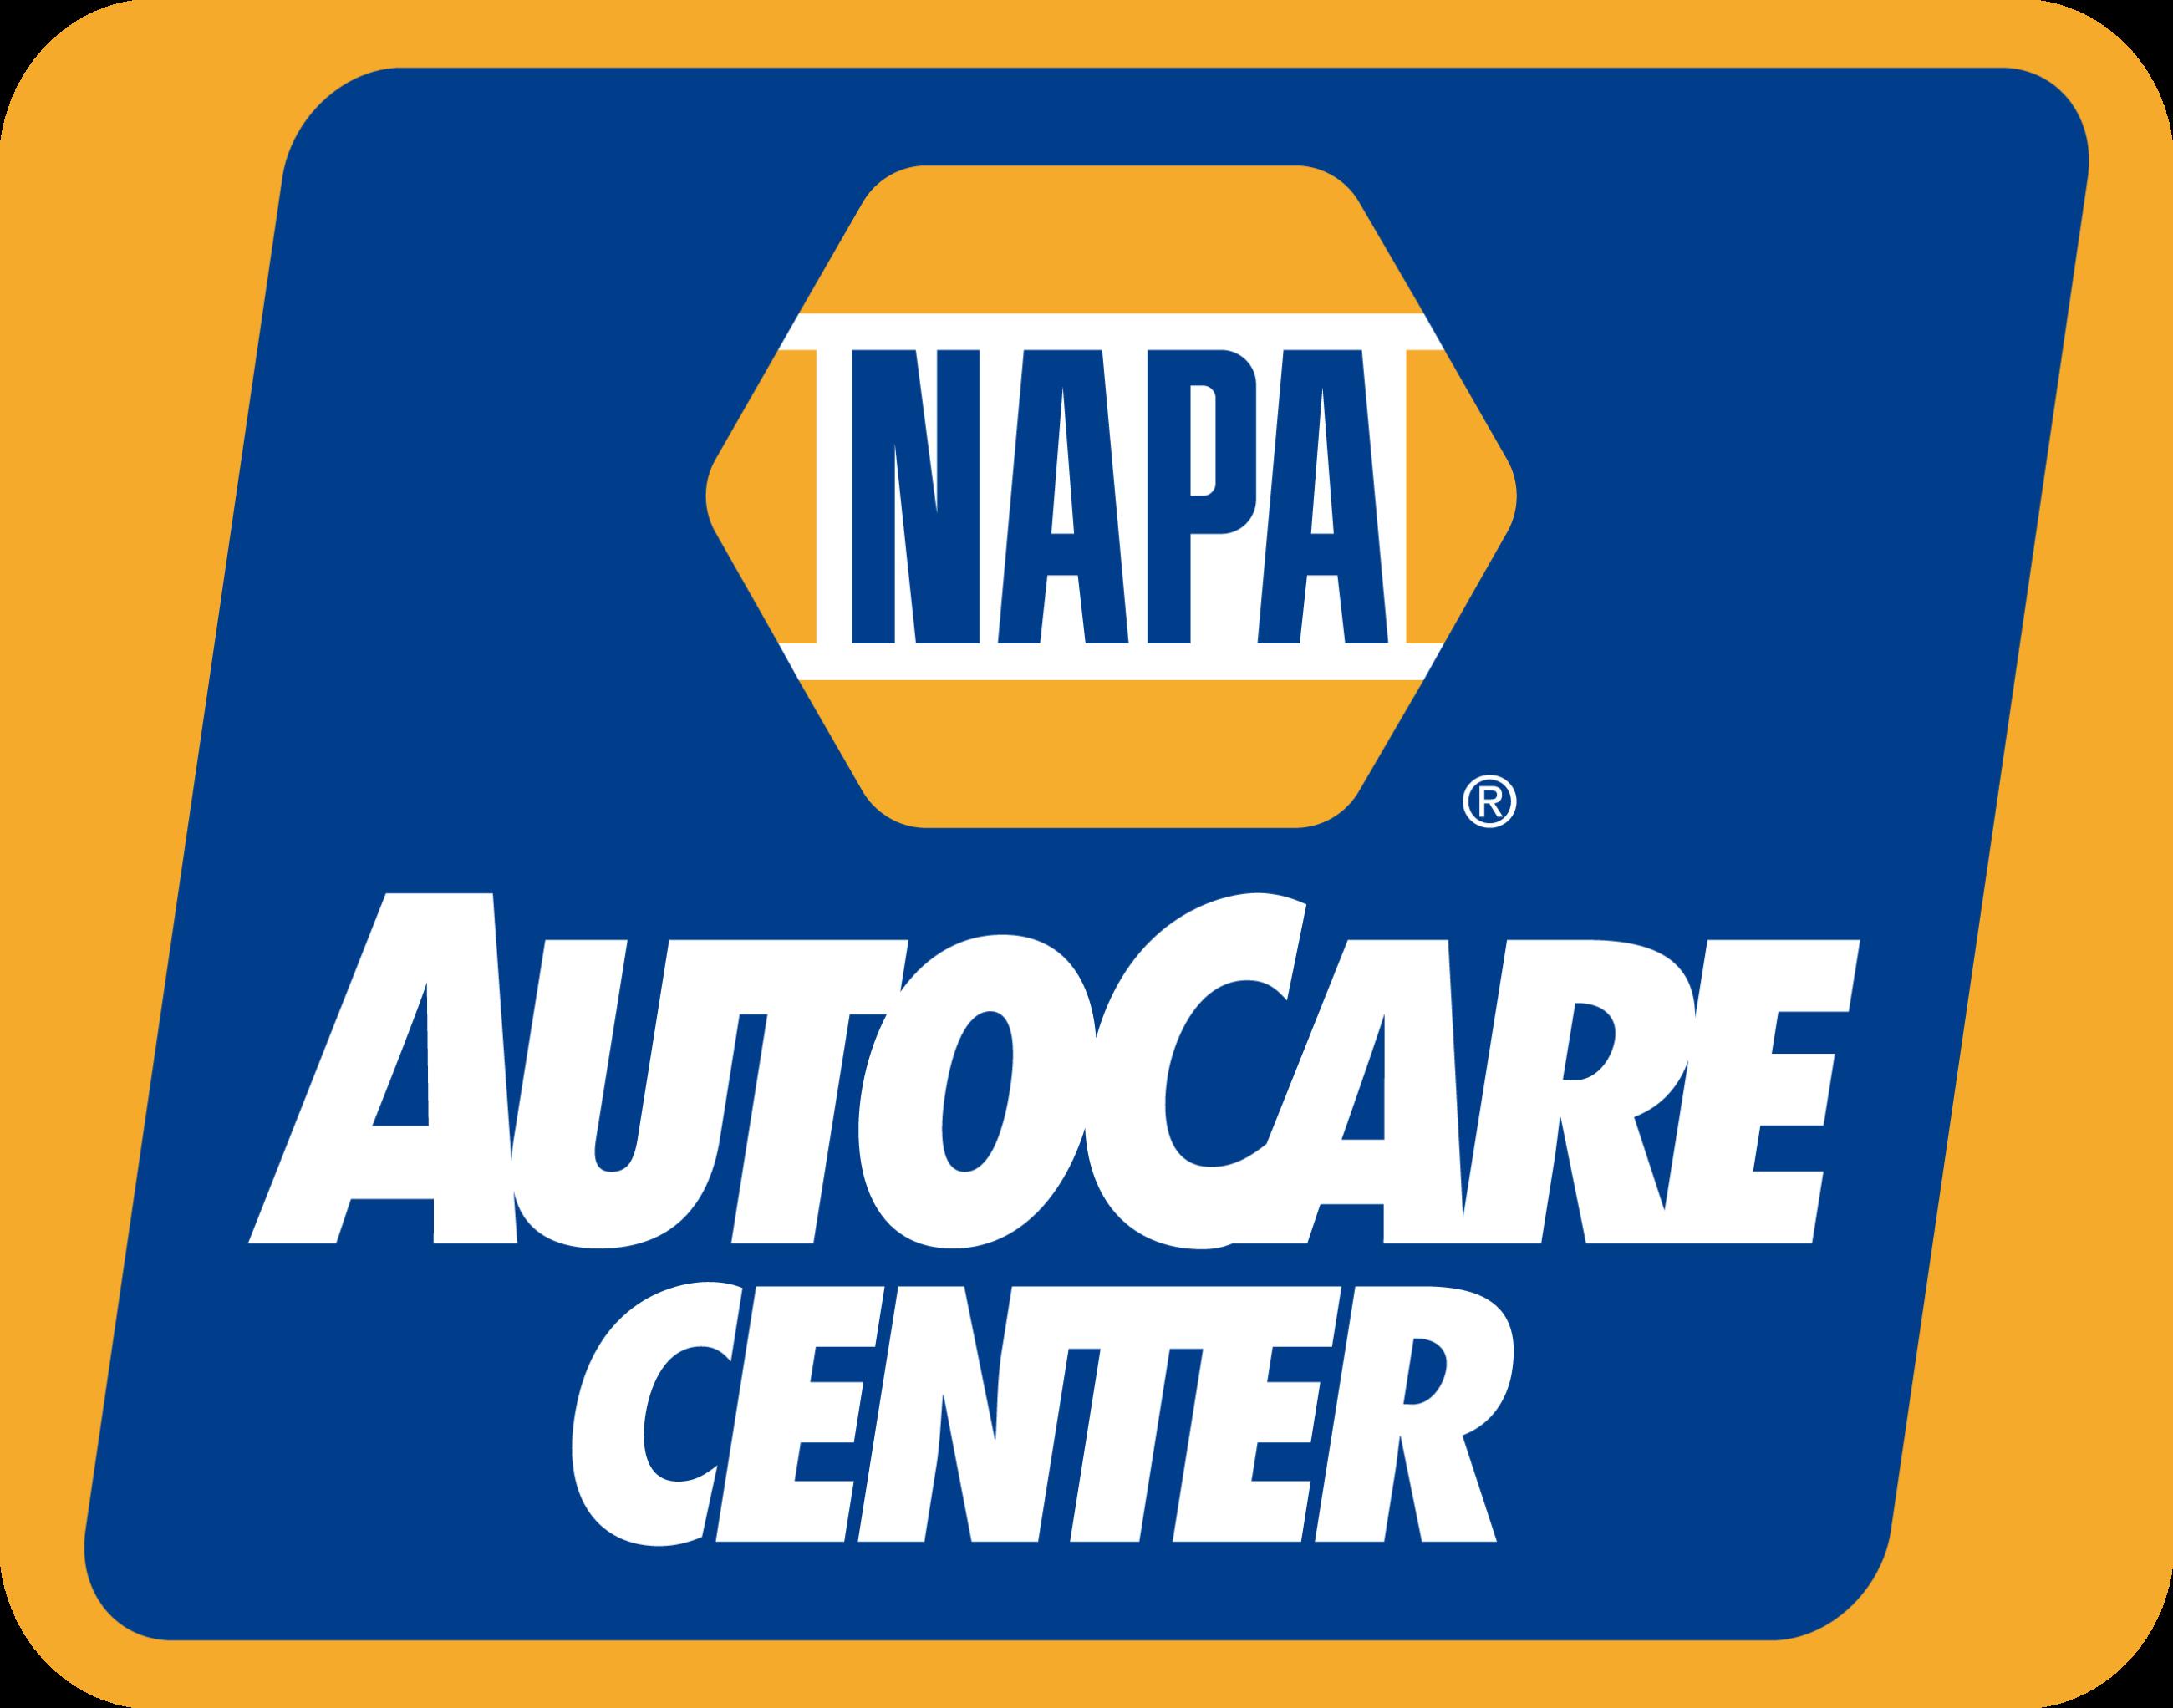 Professional auto repair and mechanic services home solutioingenieria Choice Image